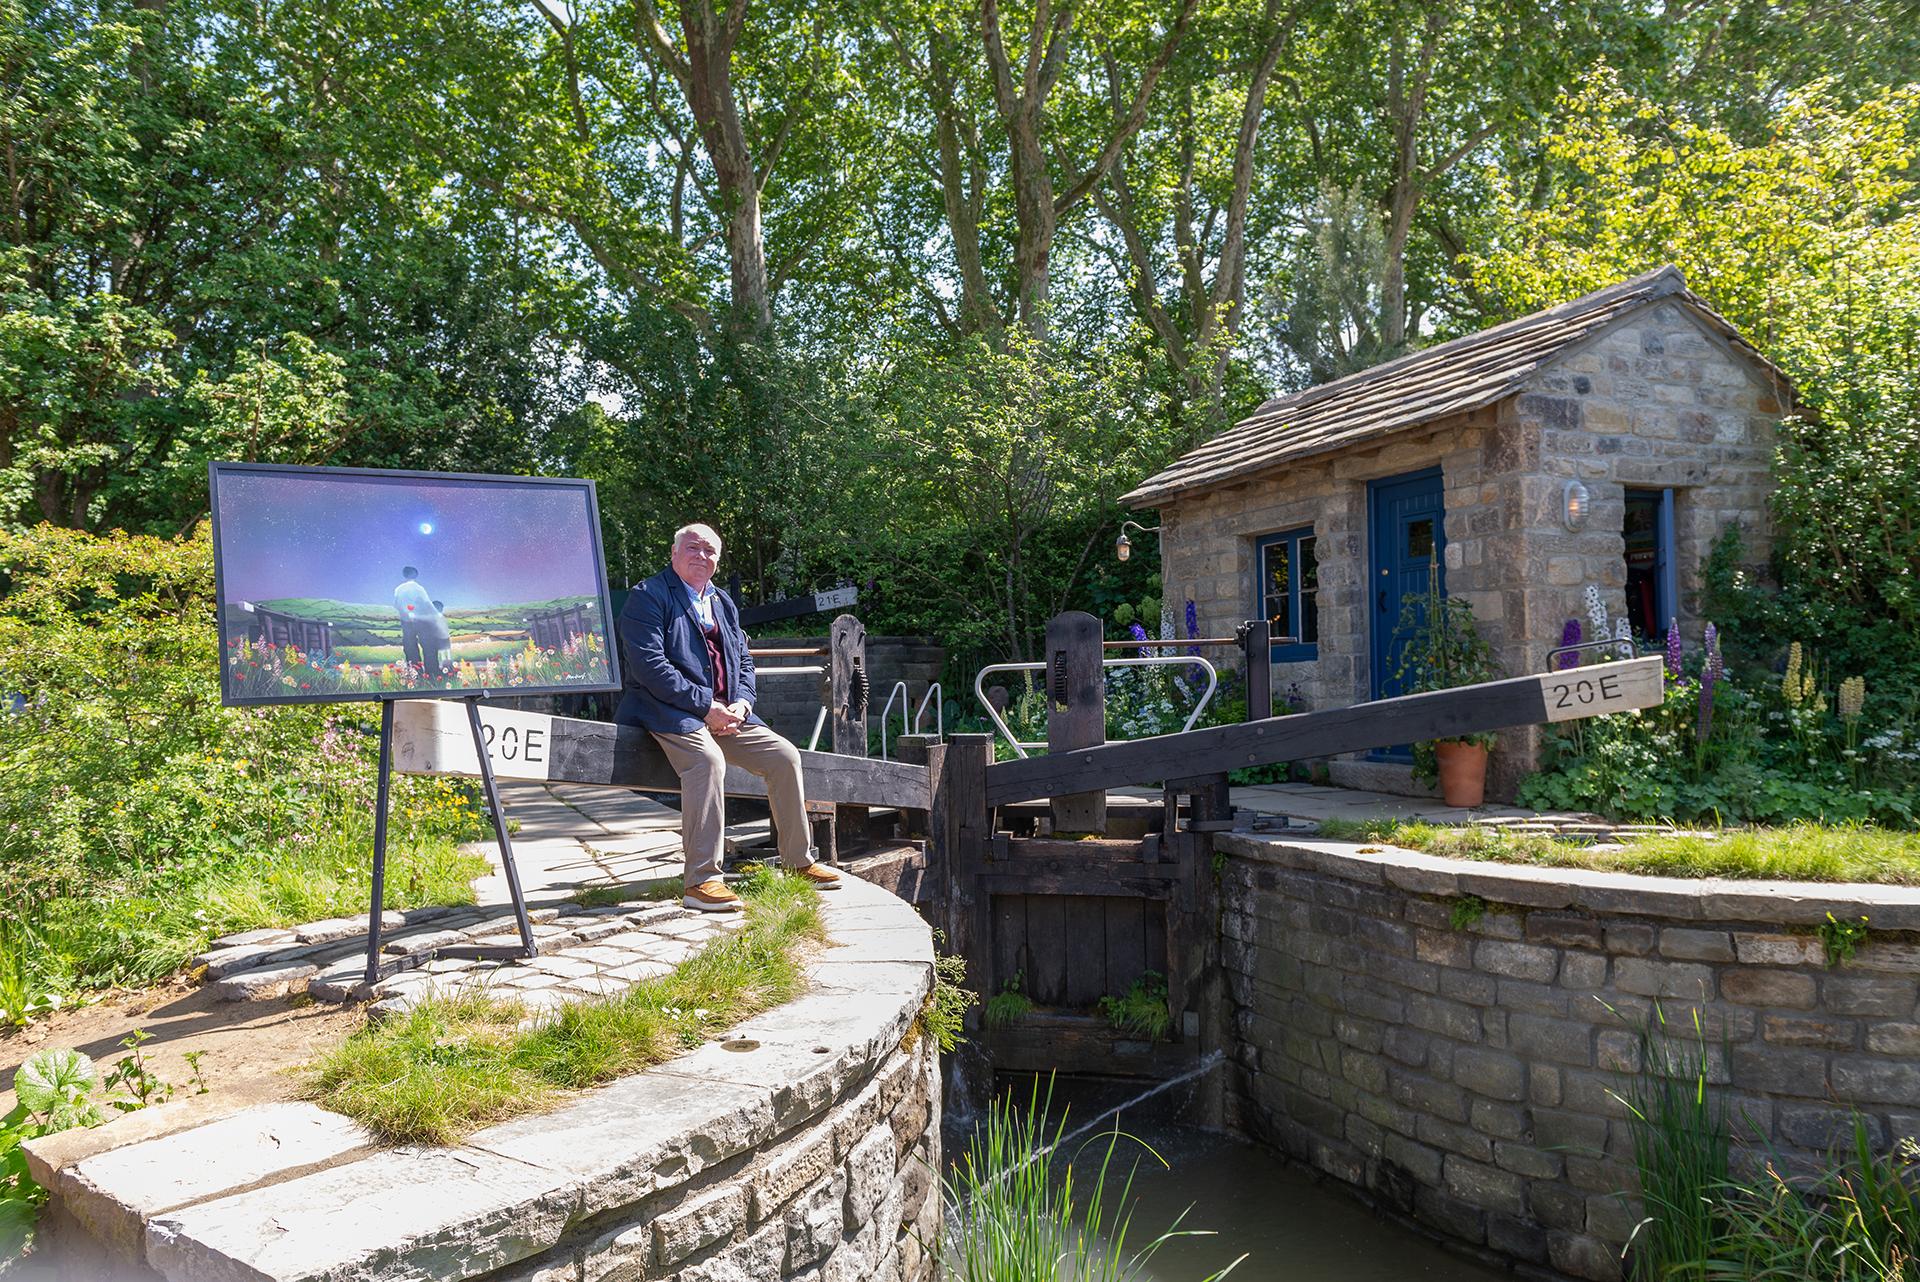 Artist mackenzie thorpe unveils welcome to yorkshire artwork alongside Chelsea flower show garden 2019